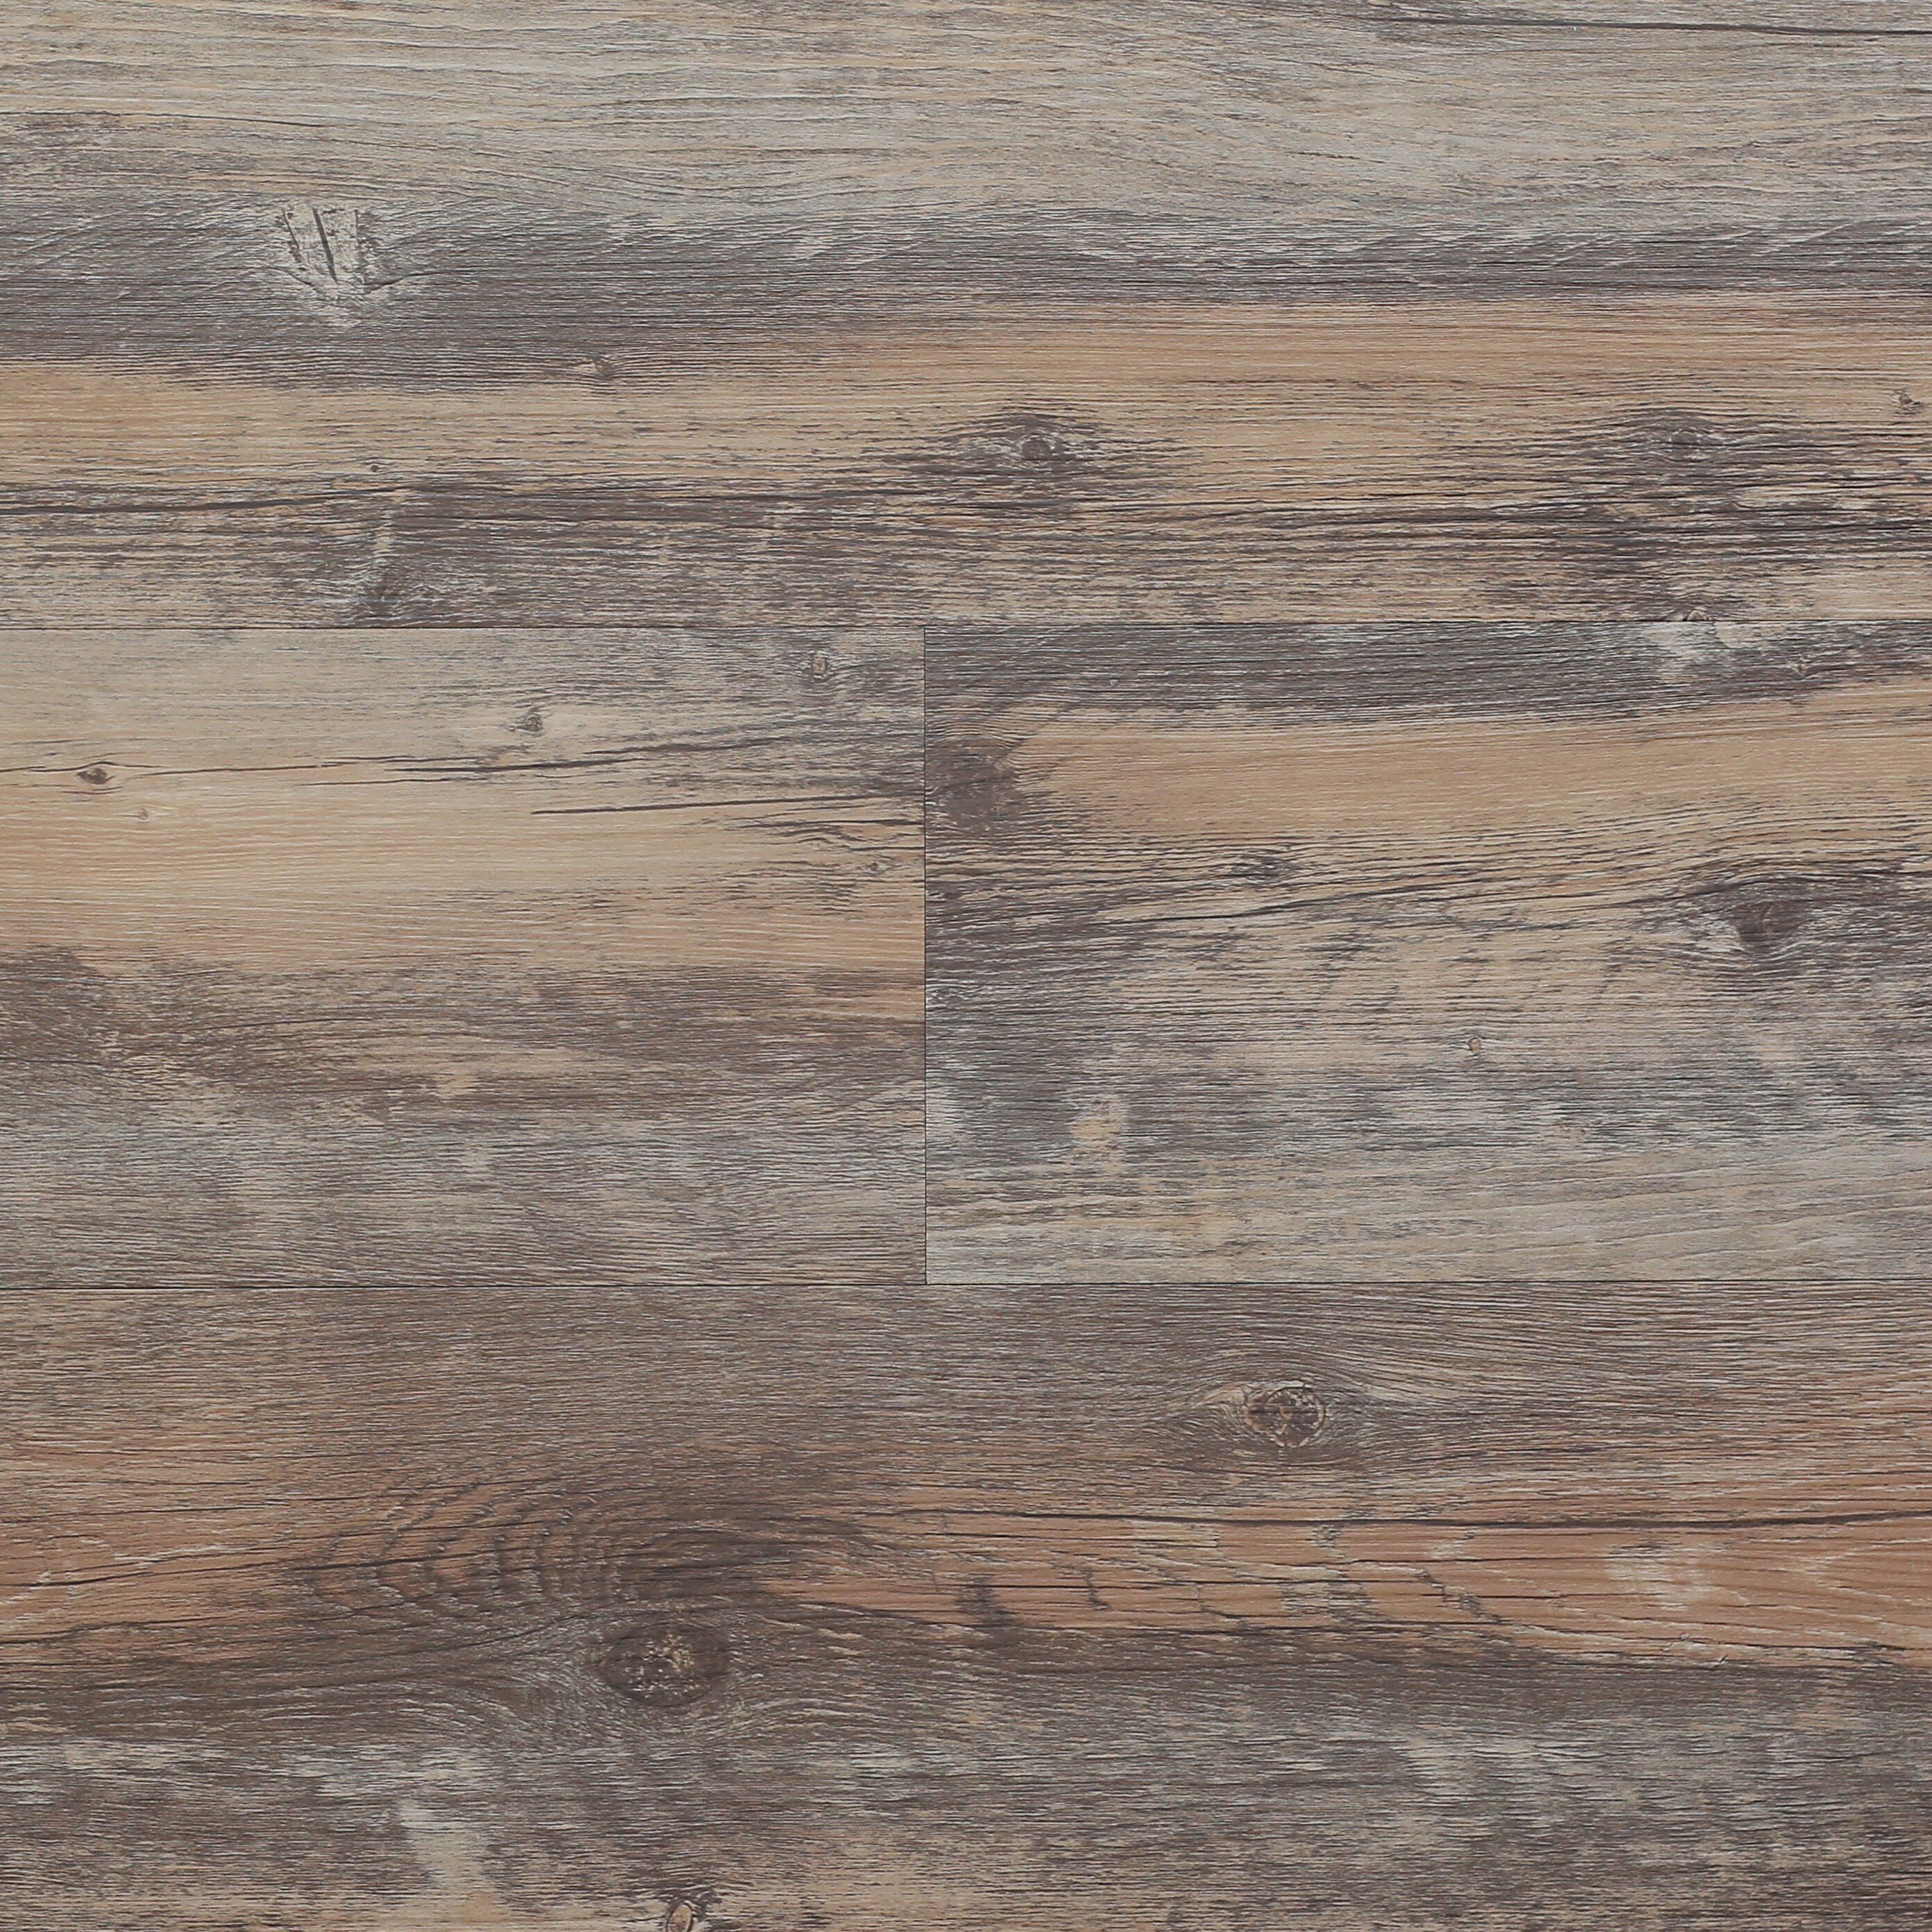 Adaptafloor 6 x 48 x 2mm luxury vinyl plank in windsor for Who makes downs luxury vinyl tile